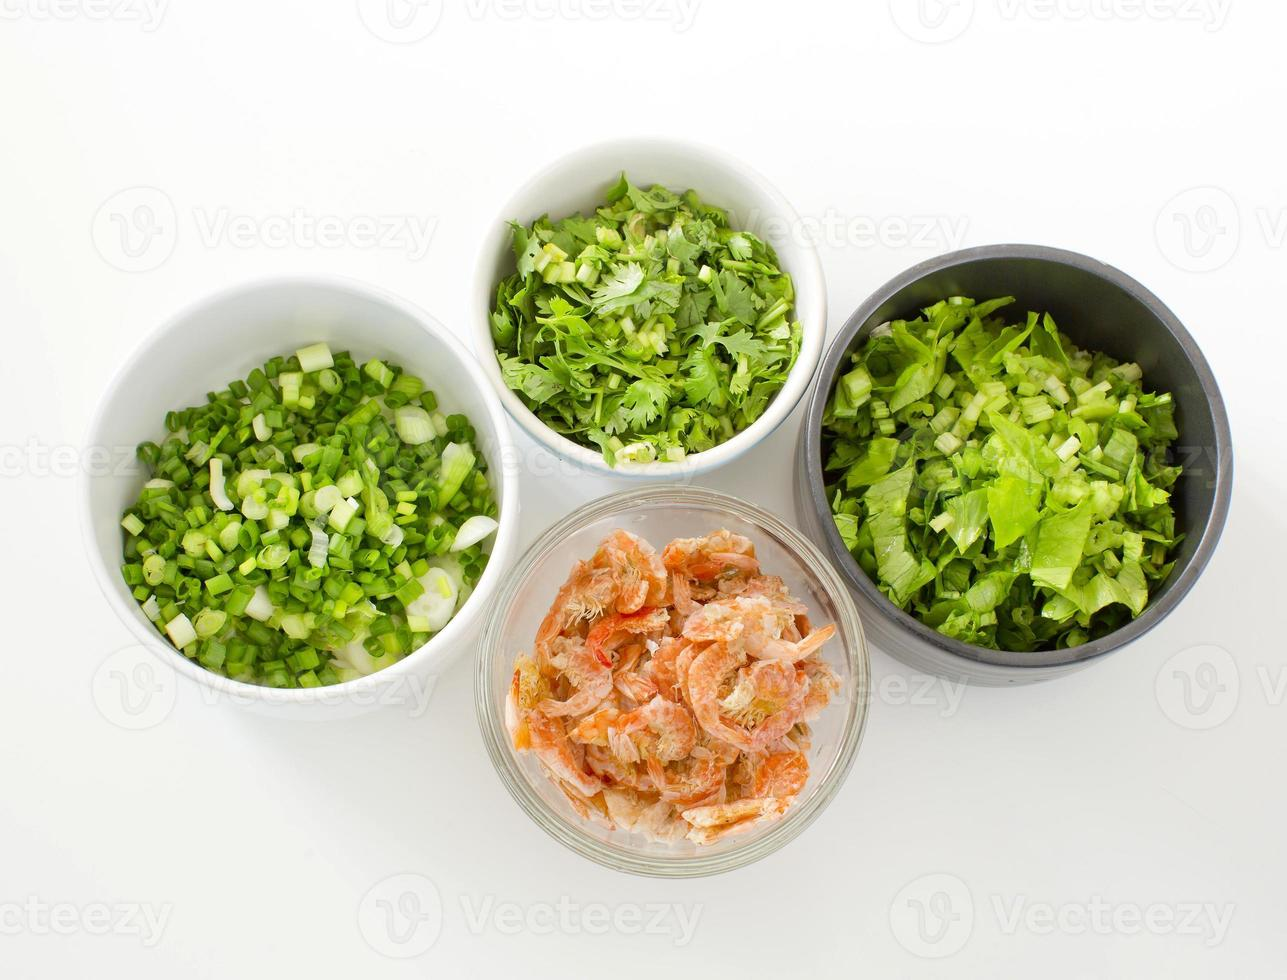 gehakte selderij, bosui, peterselie en gedroogde gezouten garnaal foto